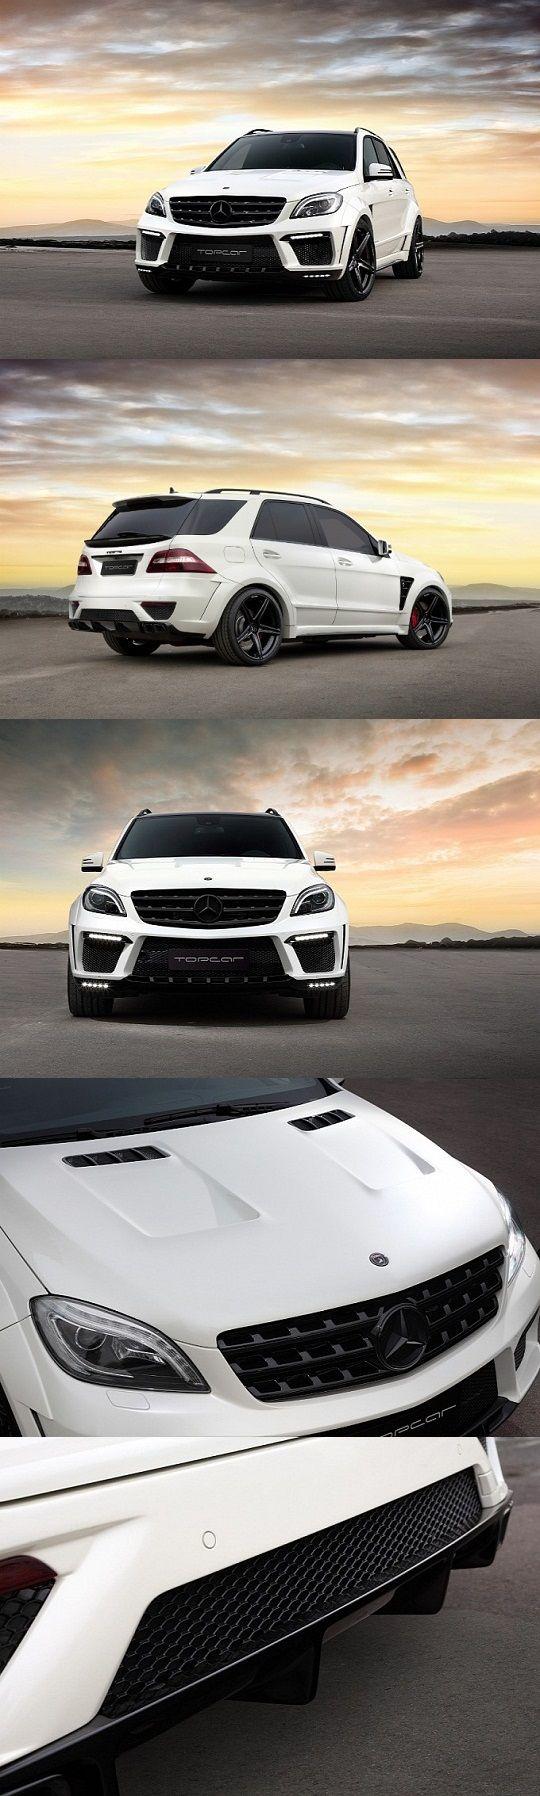 Mercedes Benz ML 63 AMG by TopCar Bumper https://www.amazon.co.uk/Baby-Car-Mirror-Shatterproof-Installation/dp/B06XHG6SSY